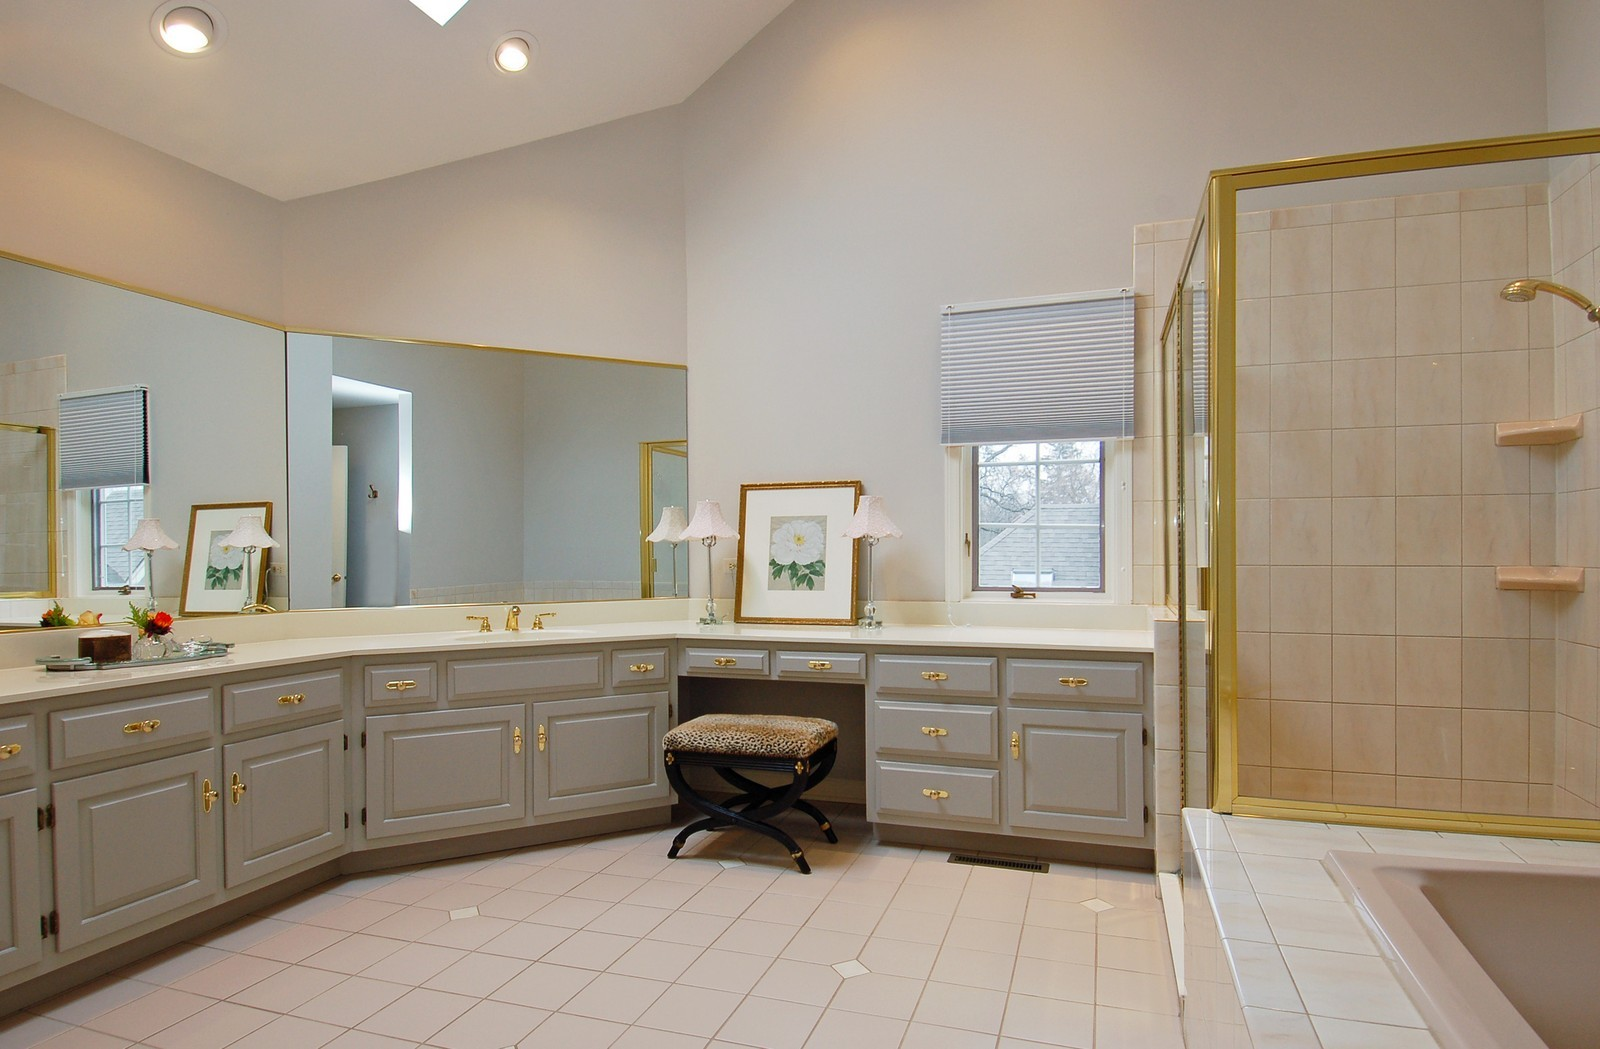 Real Estate Photography - 1492 Lloyd, Wheaton, IL, 60189 - Master Bathroom